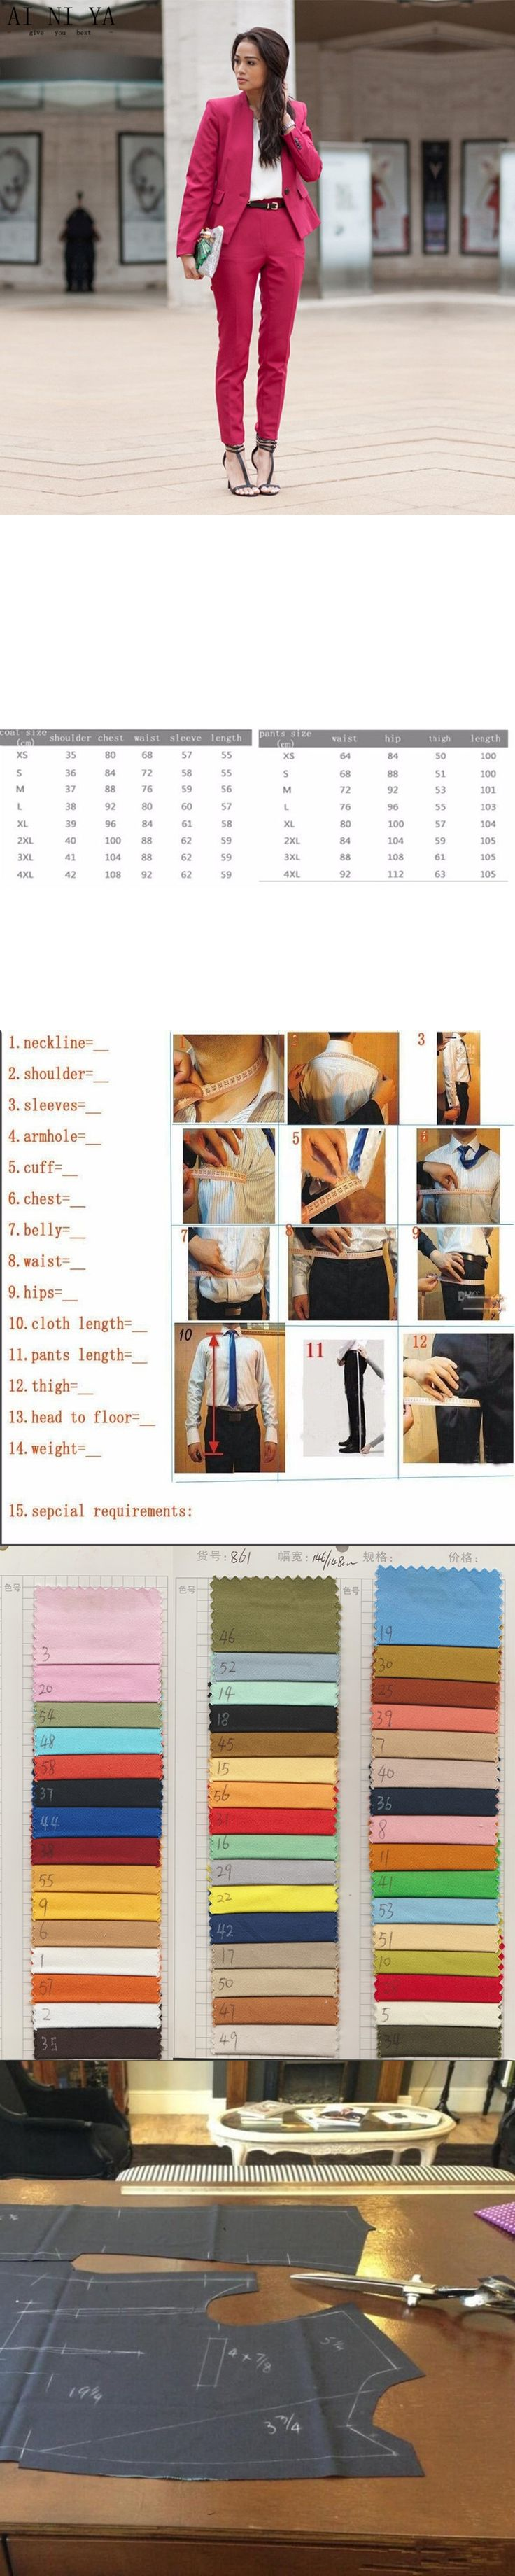 Rose Red Women Business Evening Pant Suits Slim Female Office Uniform Formal 2 Piece Suits Ladies Trouser Suit Custom Made